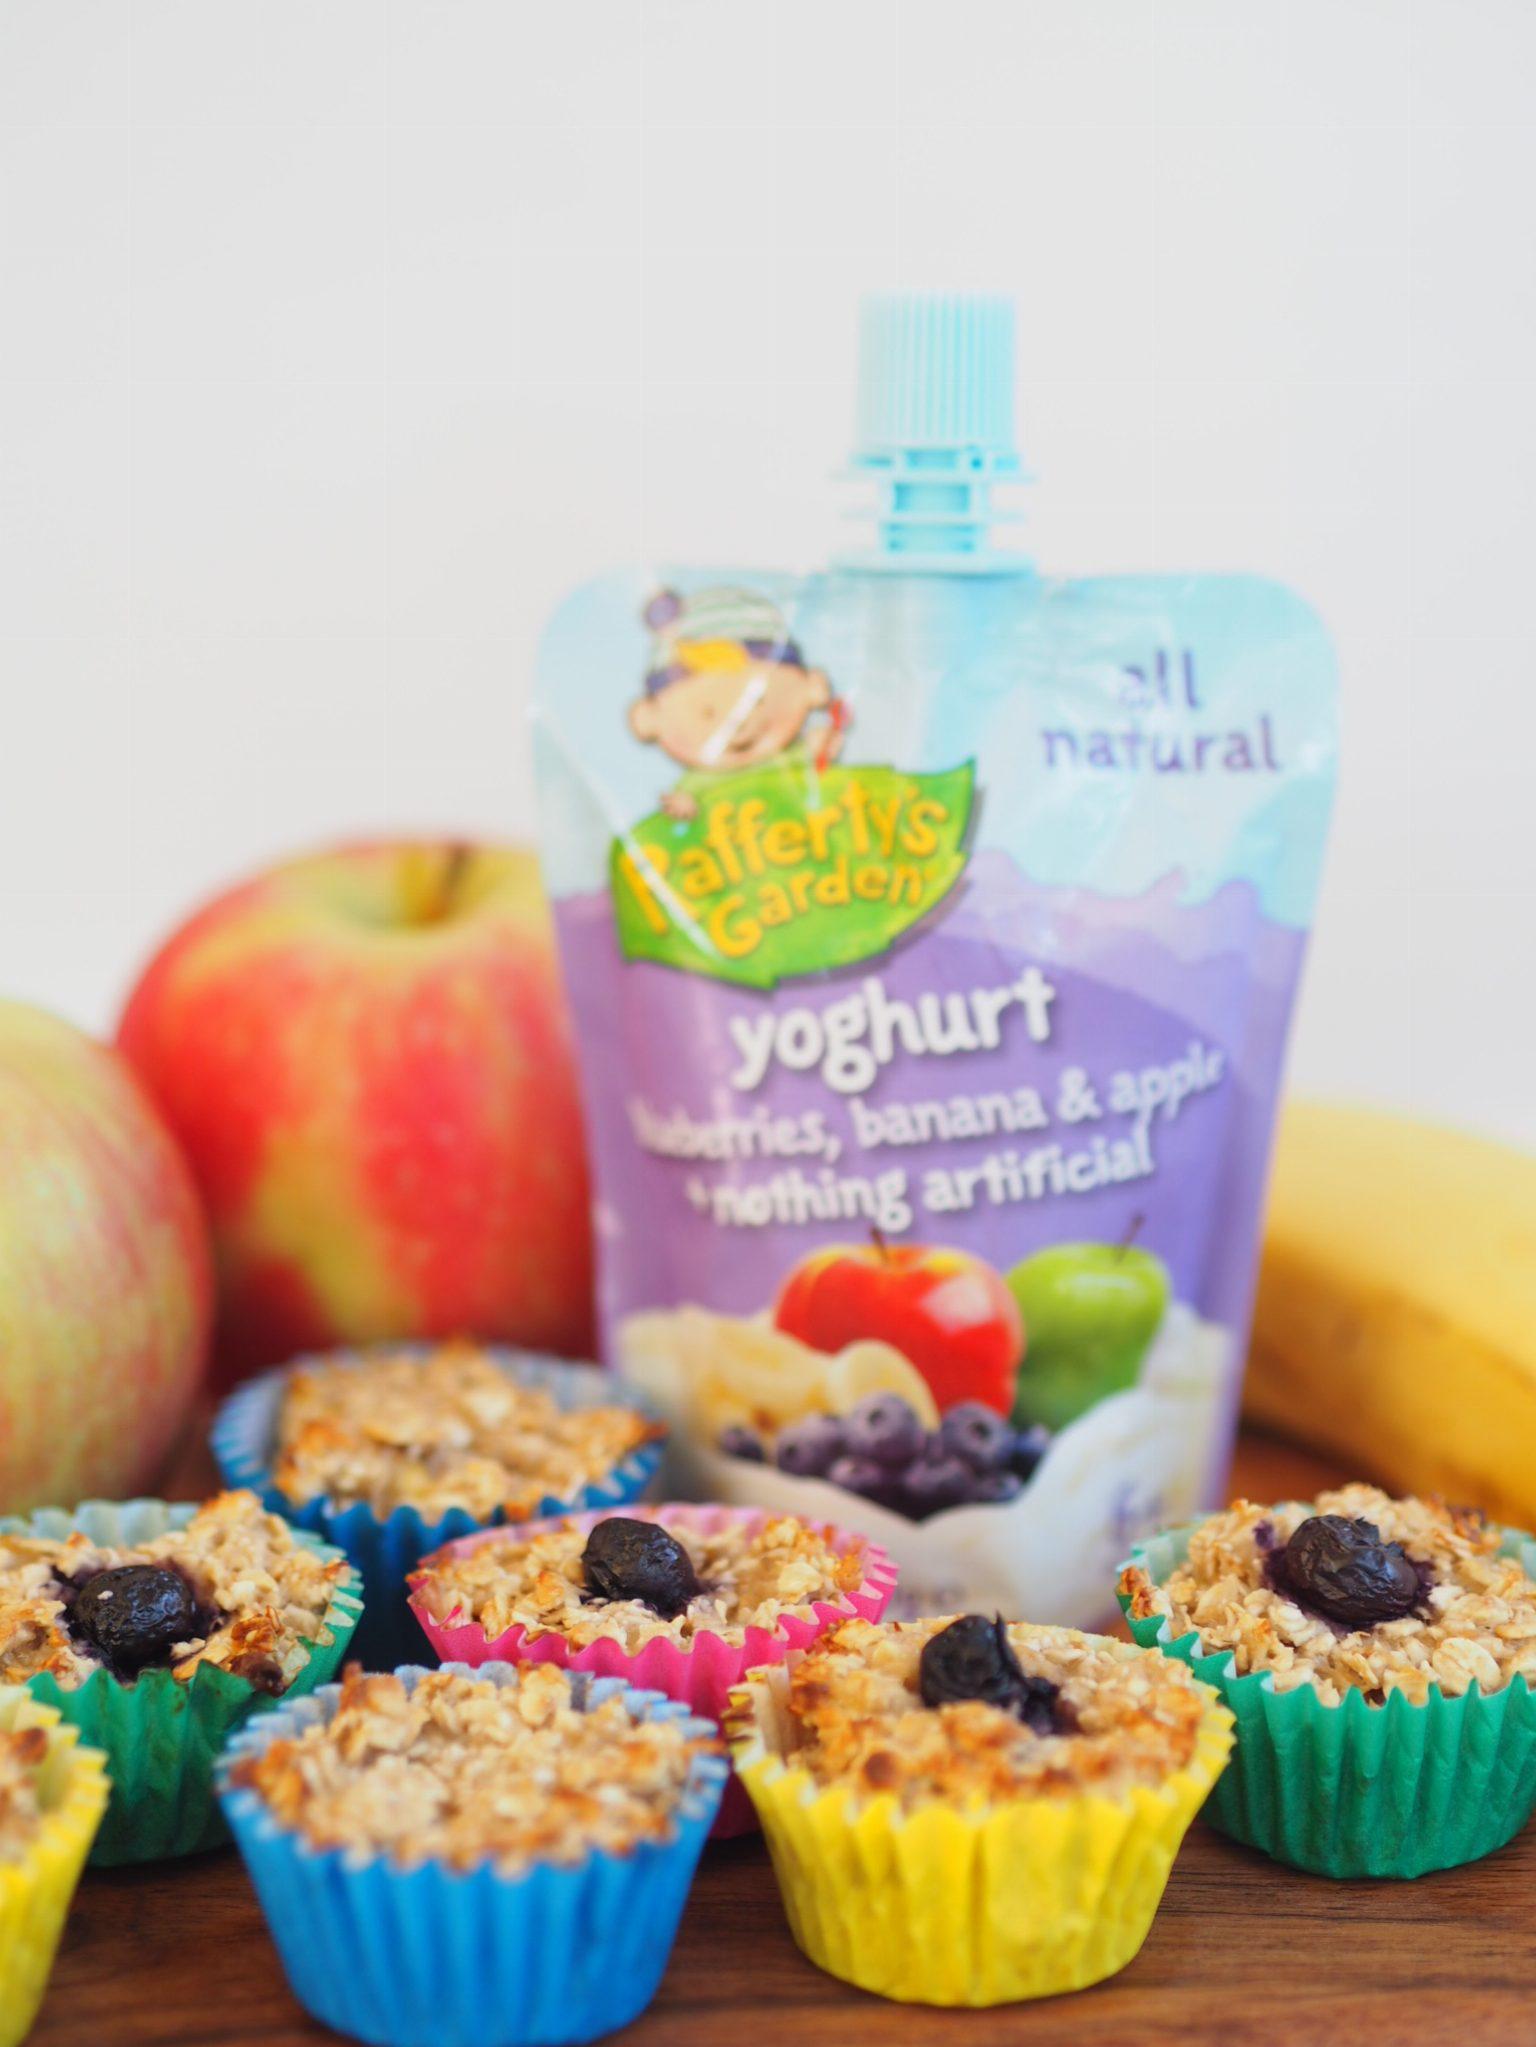 Oaty Yoghurt Blueberry, Banana and Apple Mini Muffins